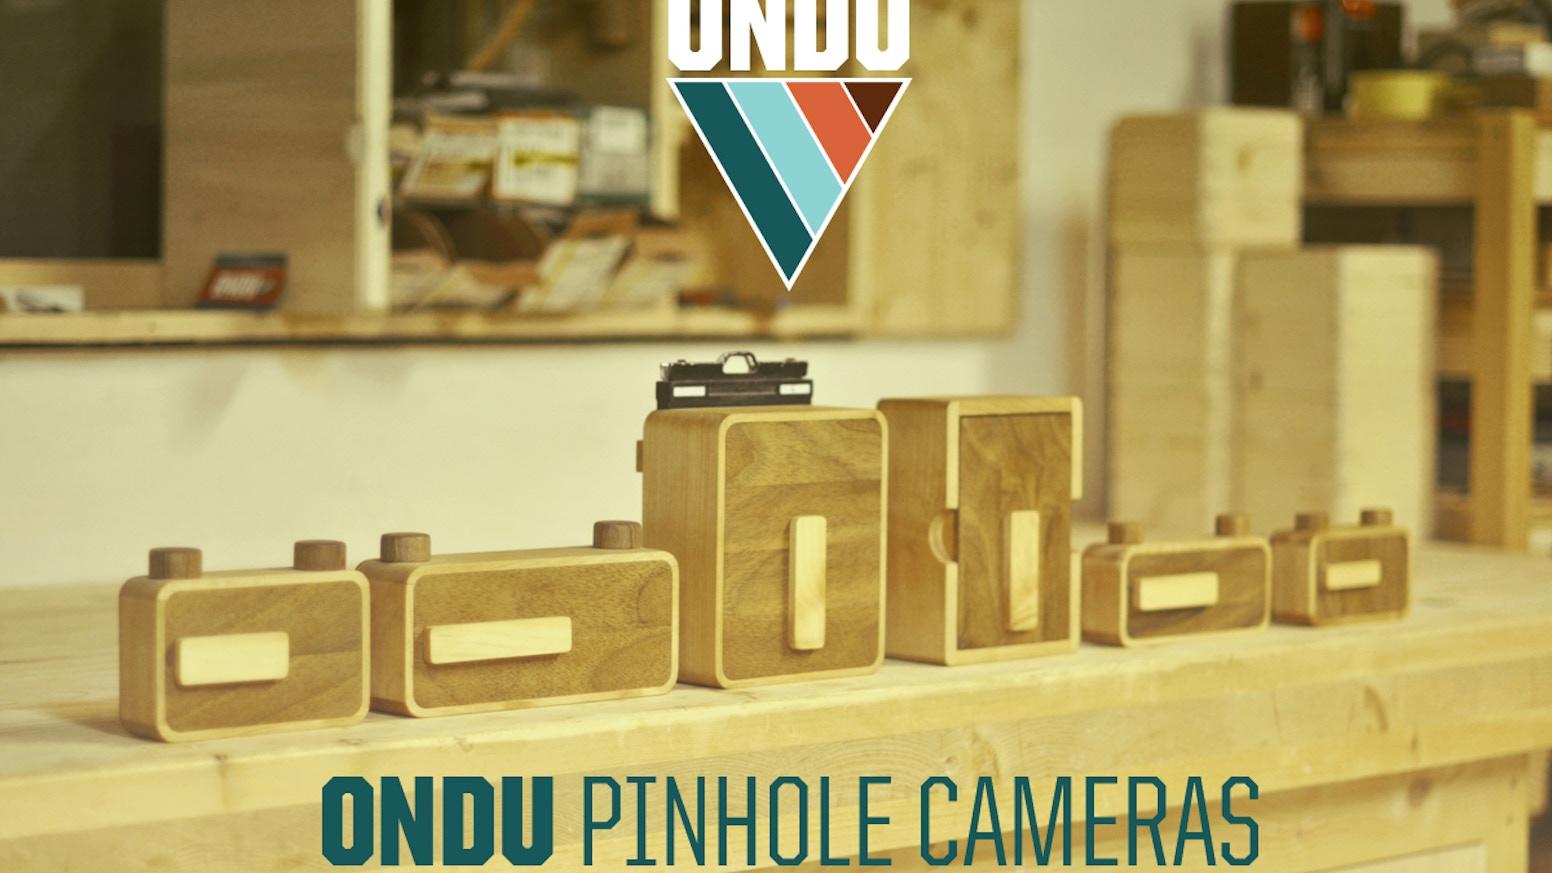 ONDU Pinhole Cameras By ONDU Kickstarter